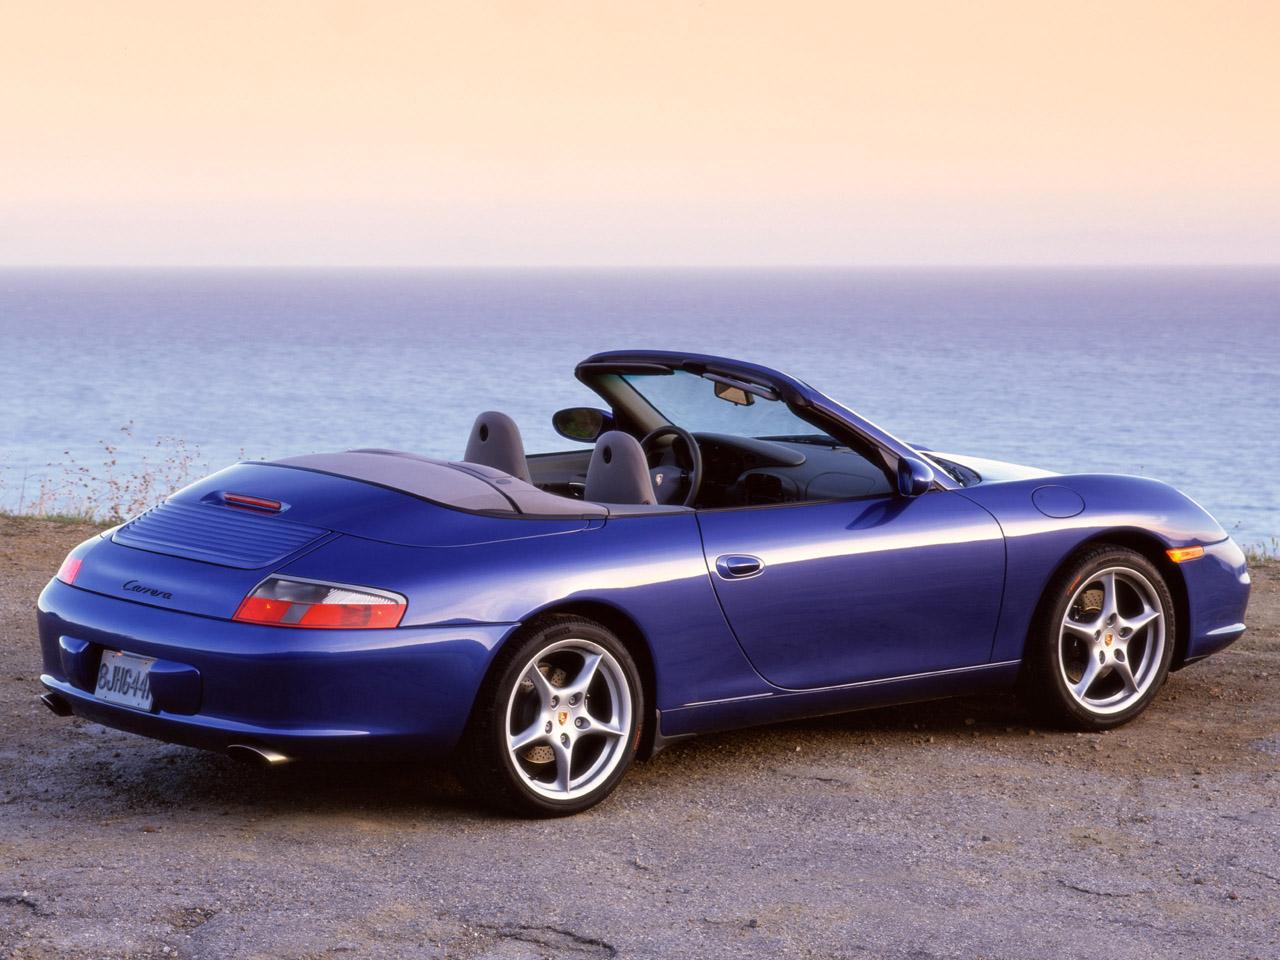 PORSCHE 911 blue